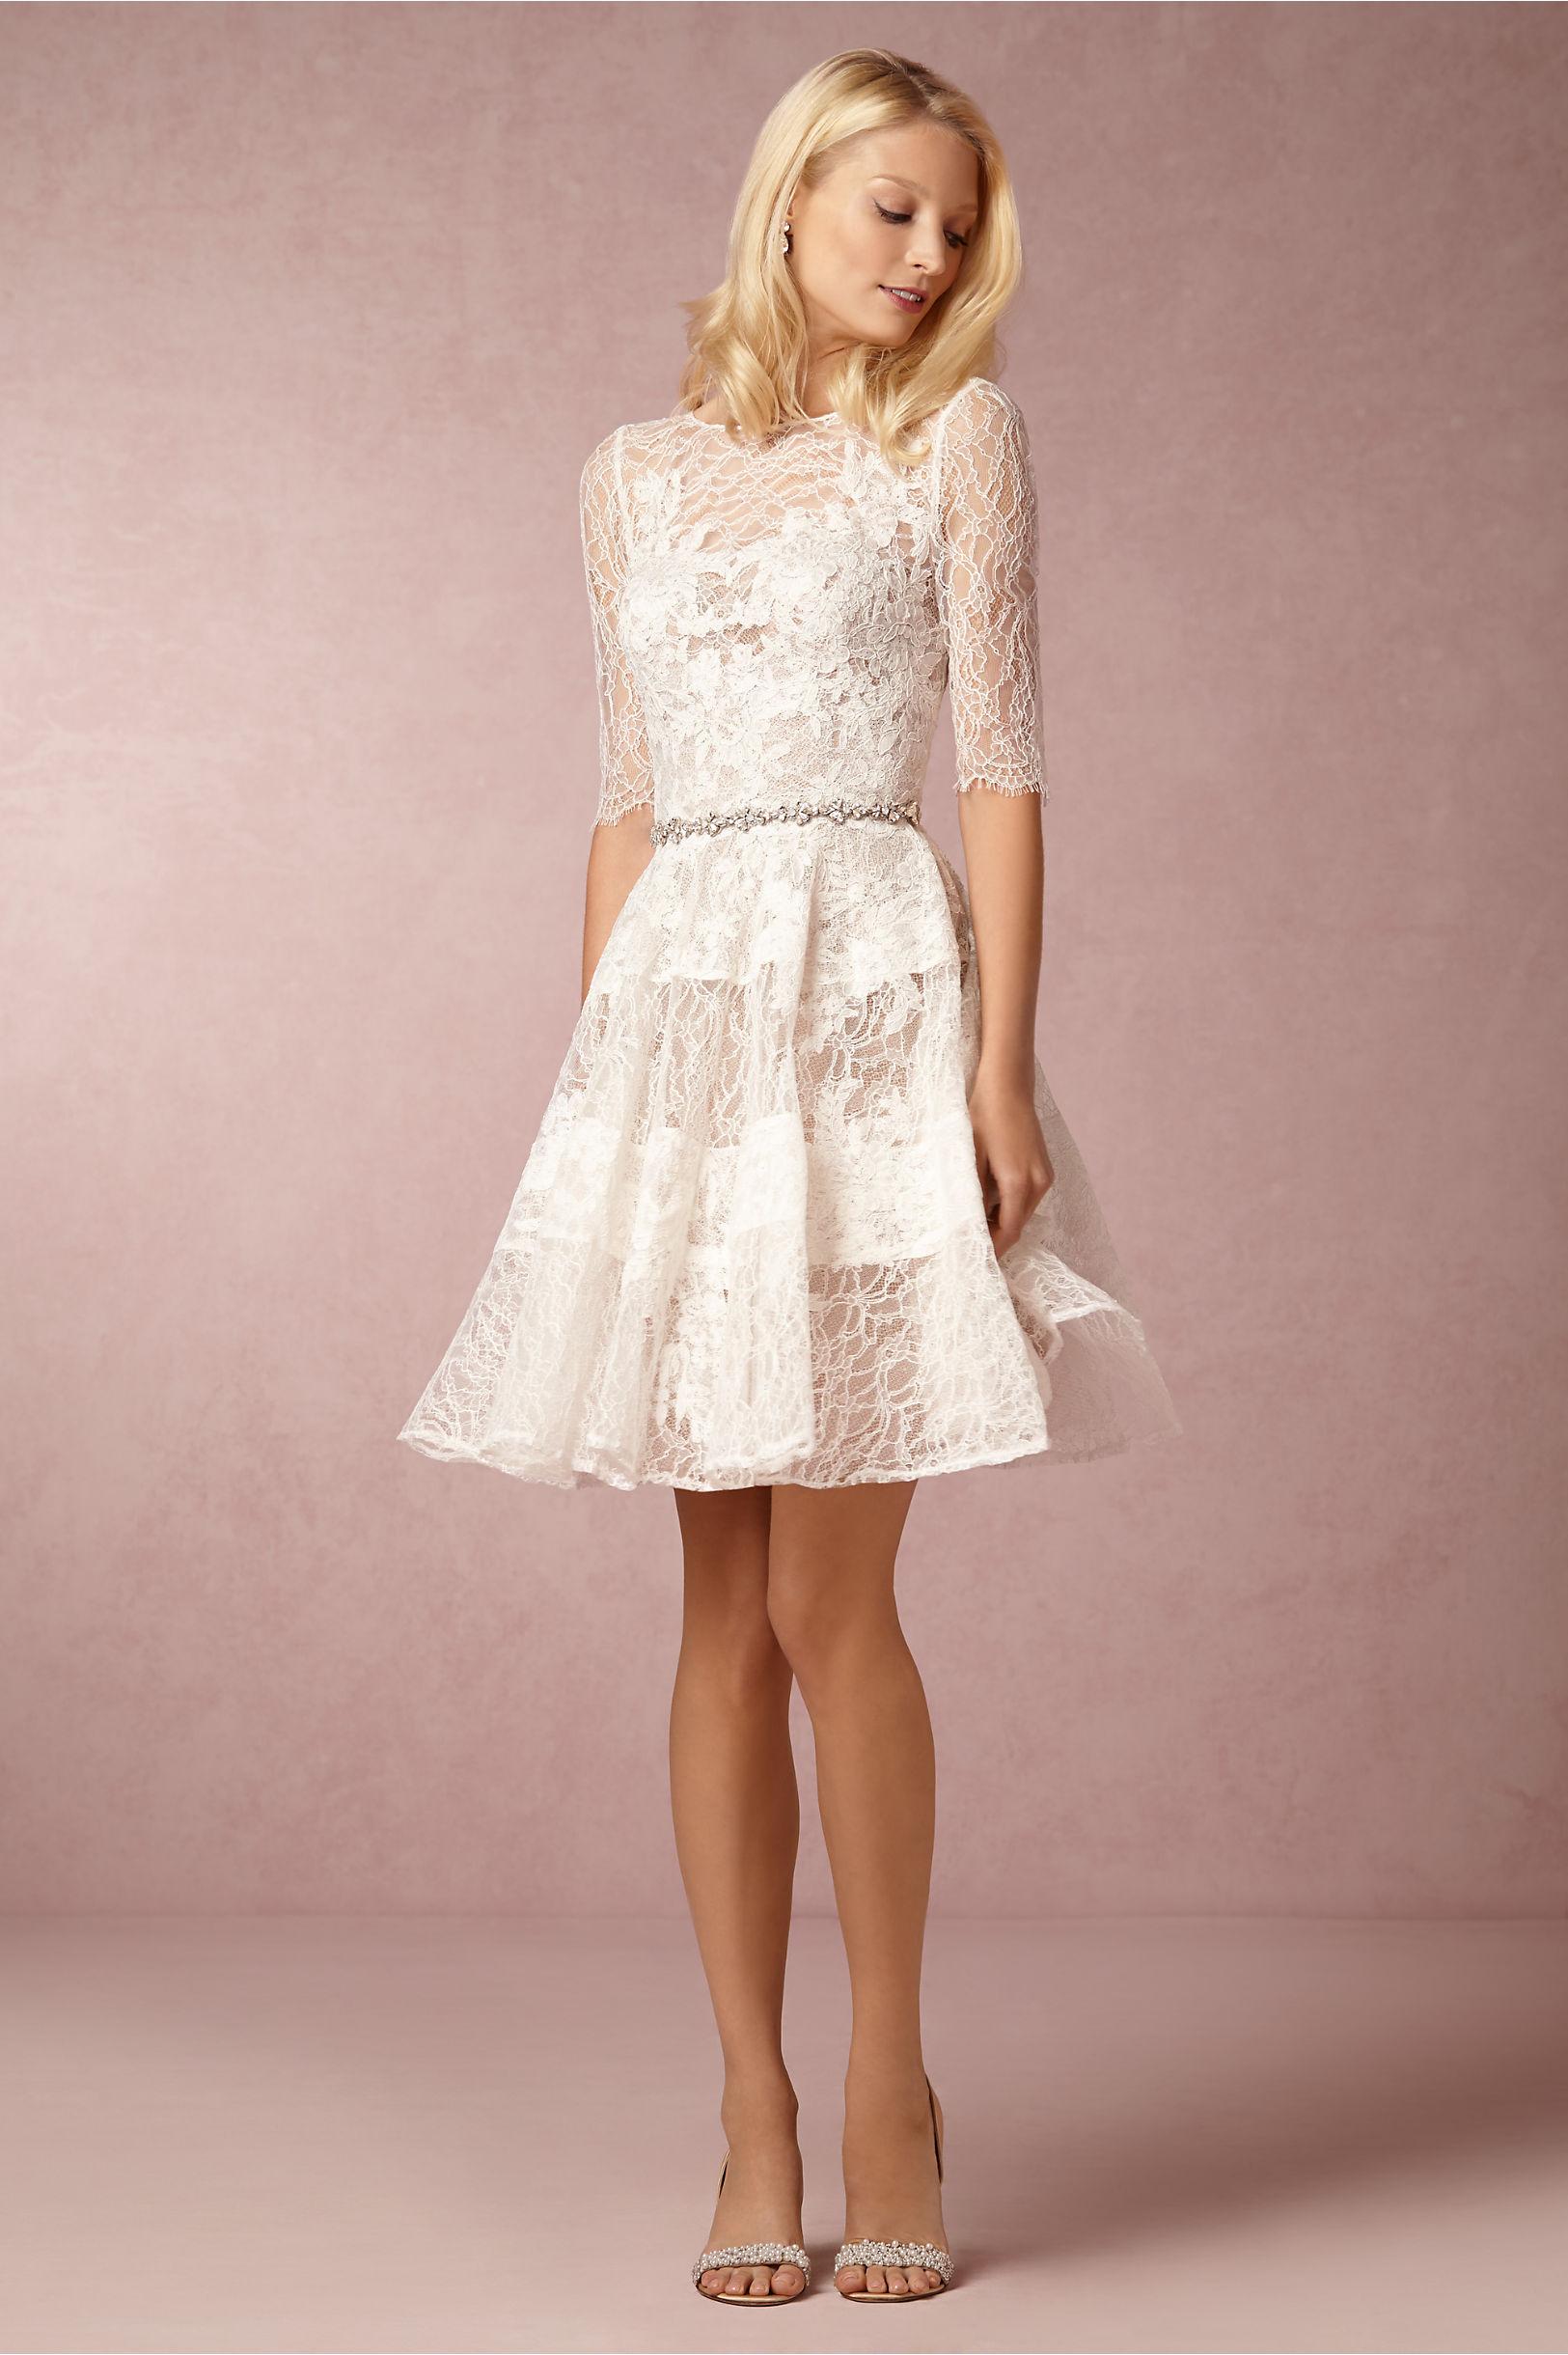 Barletta Dress in Bride | BHLDN